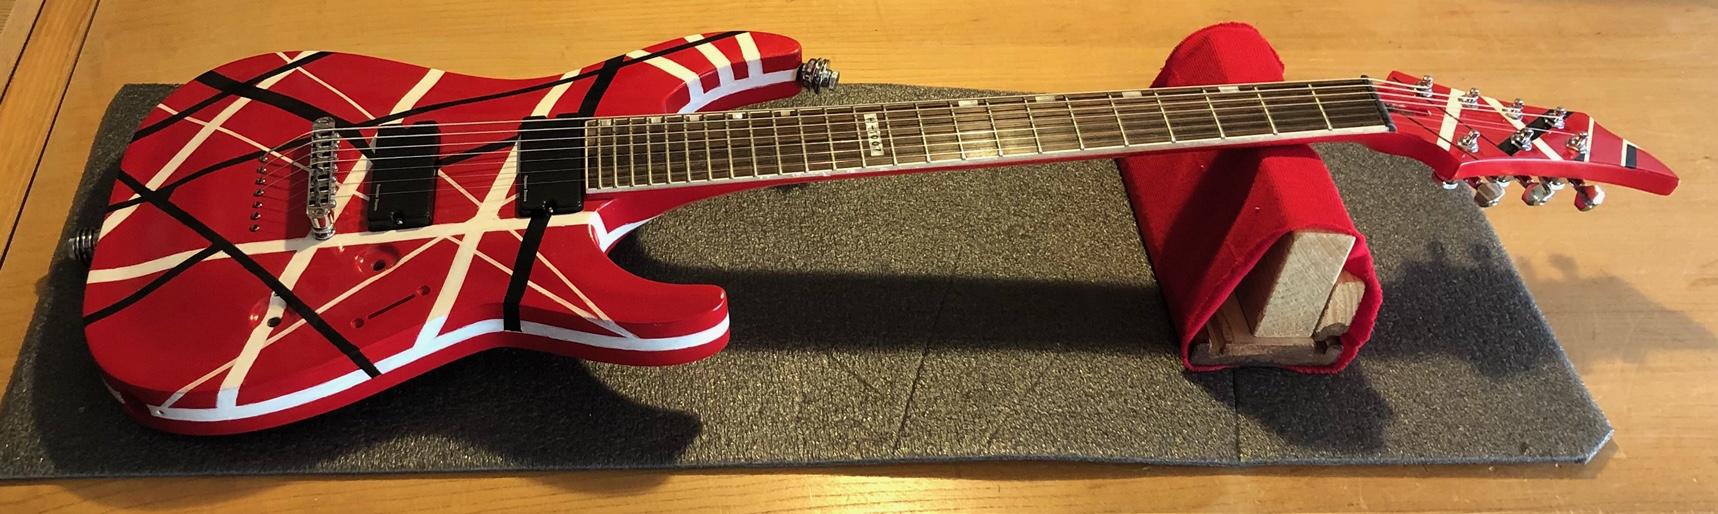 EVH Guitar Project Build